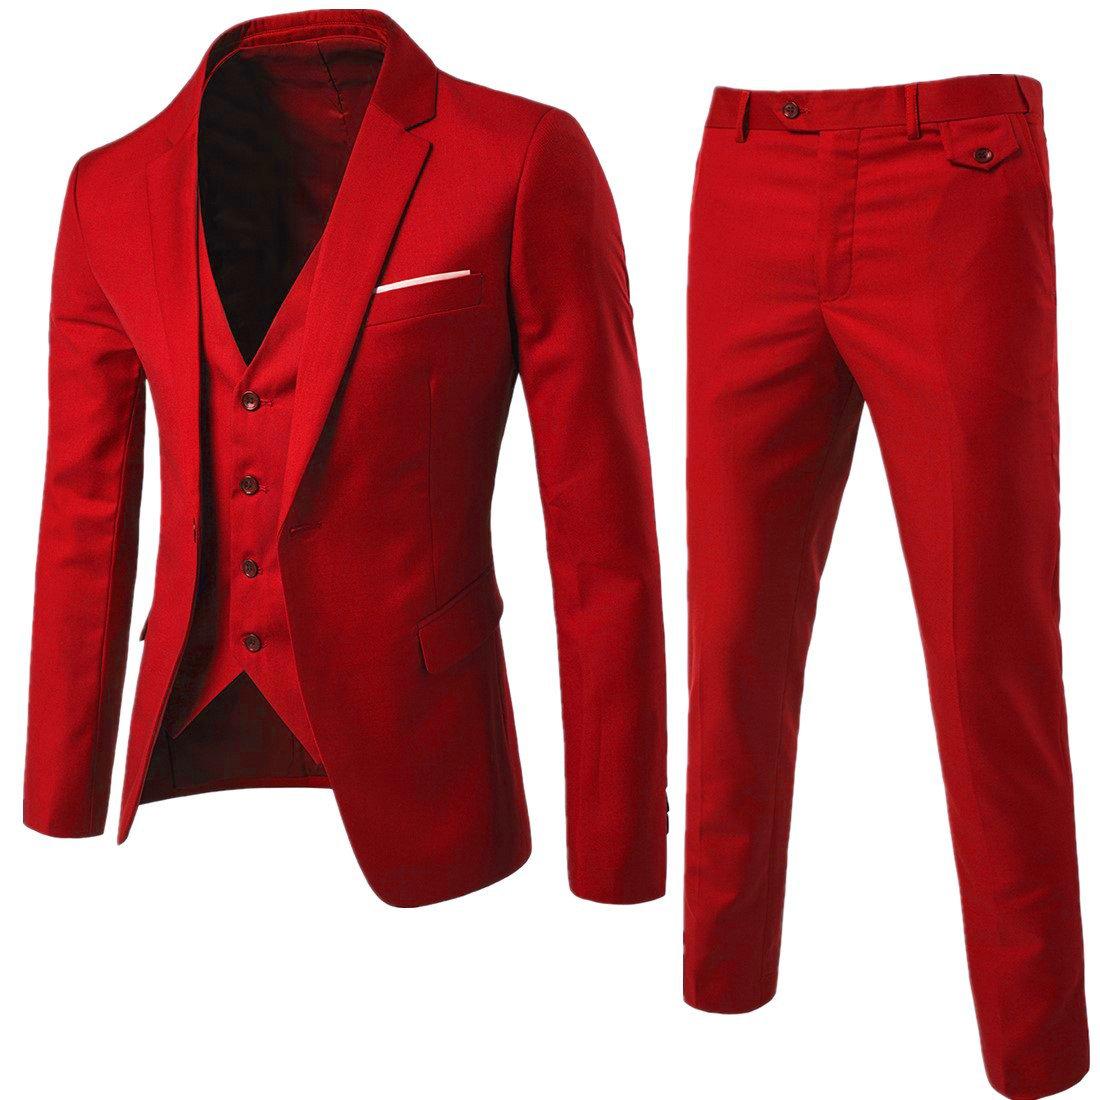 Wenliu Men's Suits 3 Pieces Wedding Suit Slim Fit Prom Party Casual Groomsman